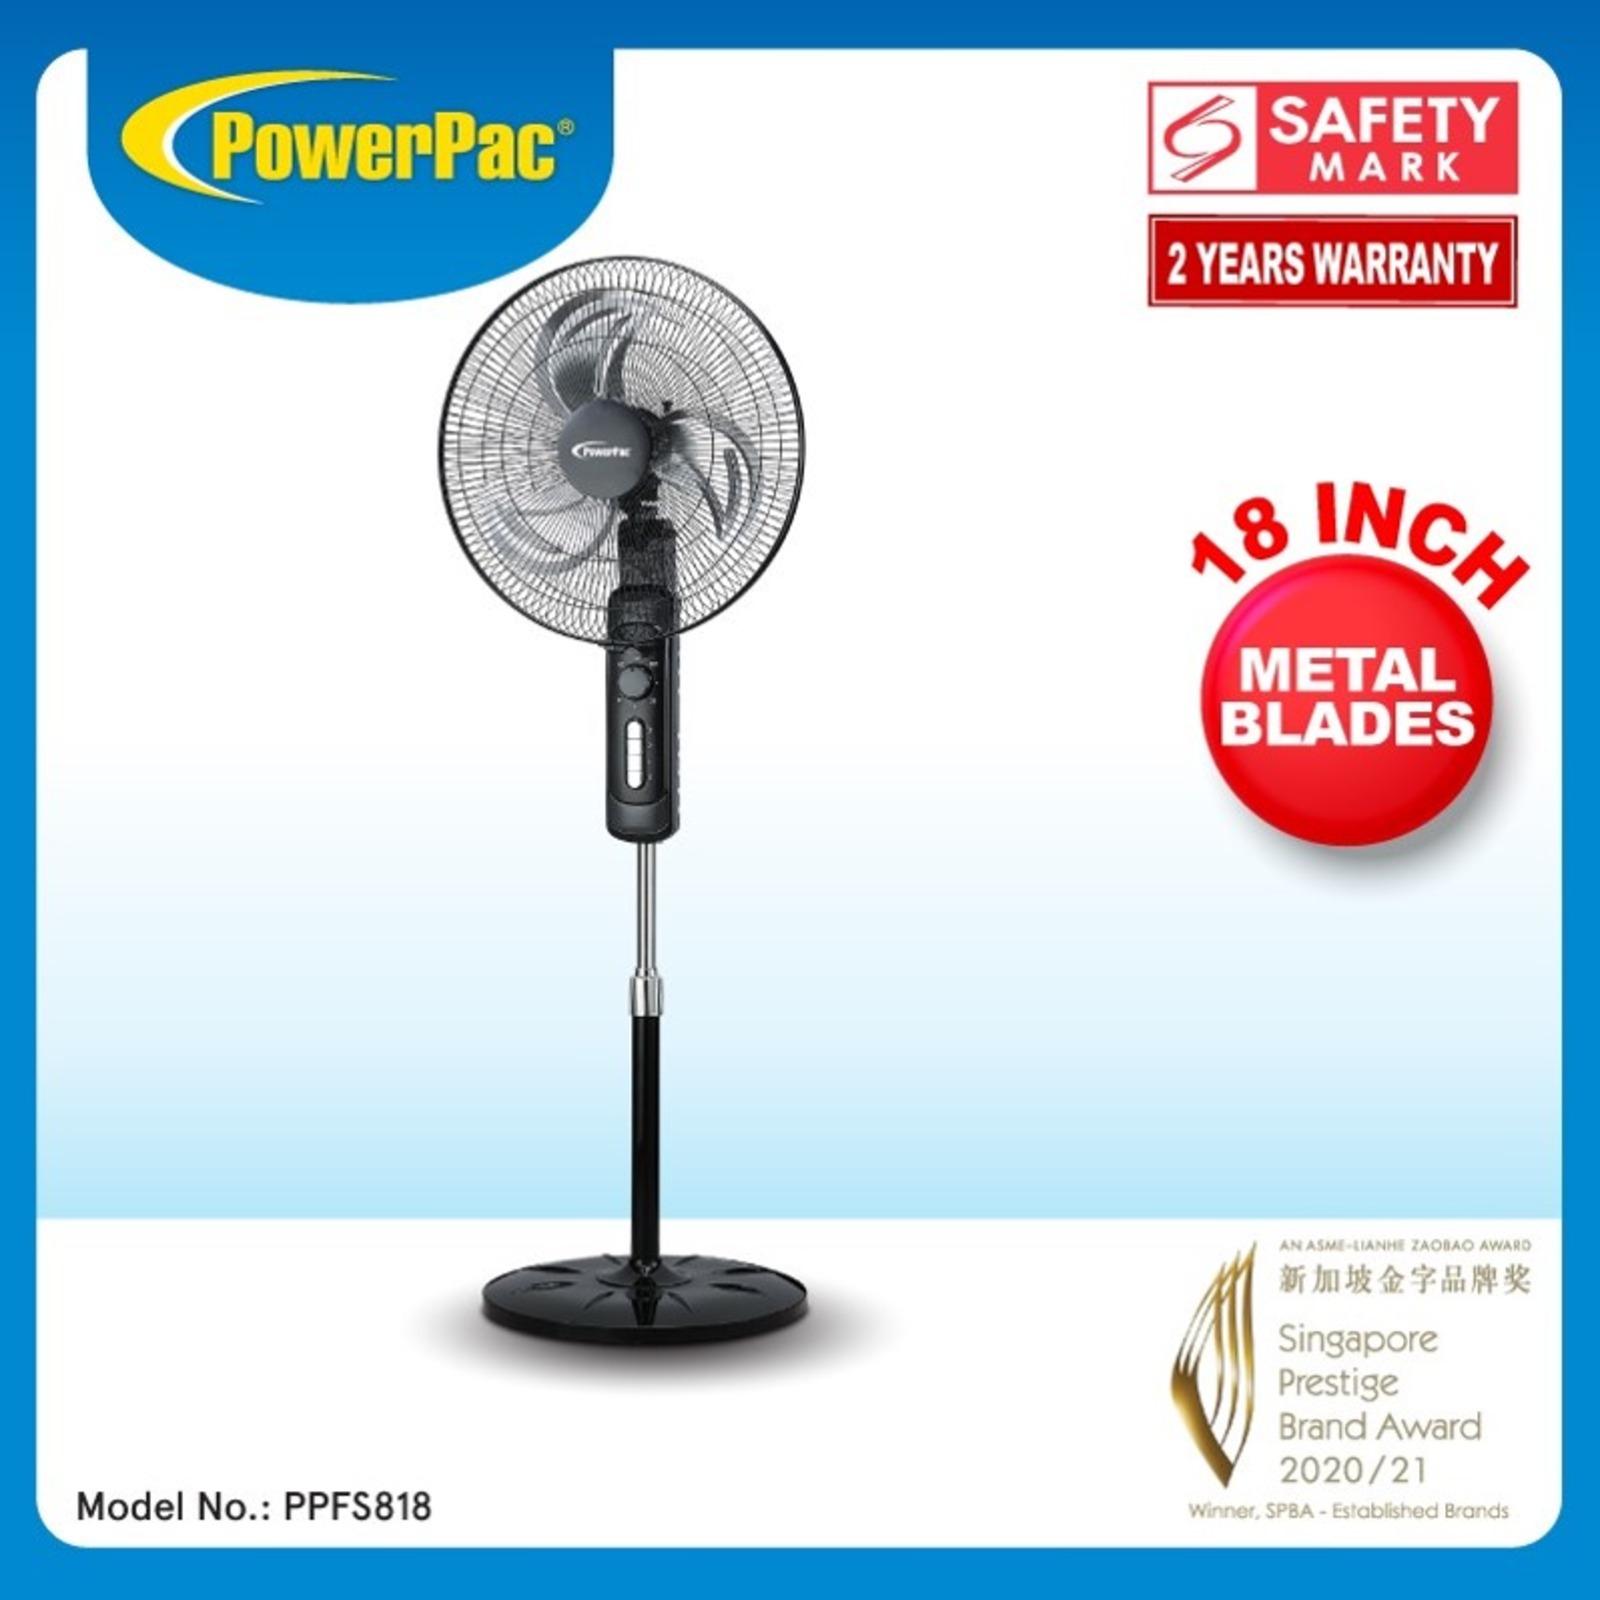 PowerPac (PPFS818) 18 Inch Stand Fan